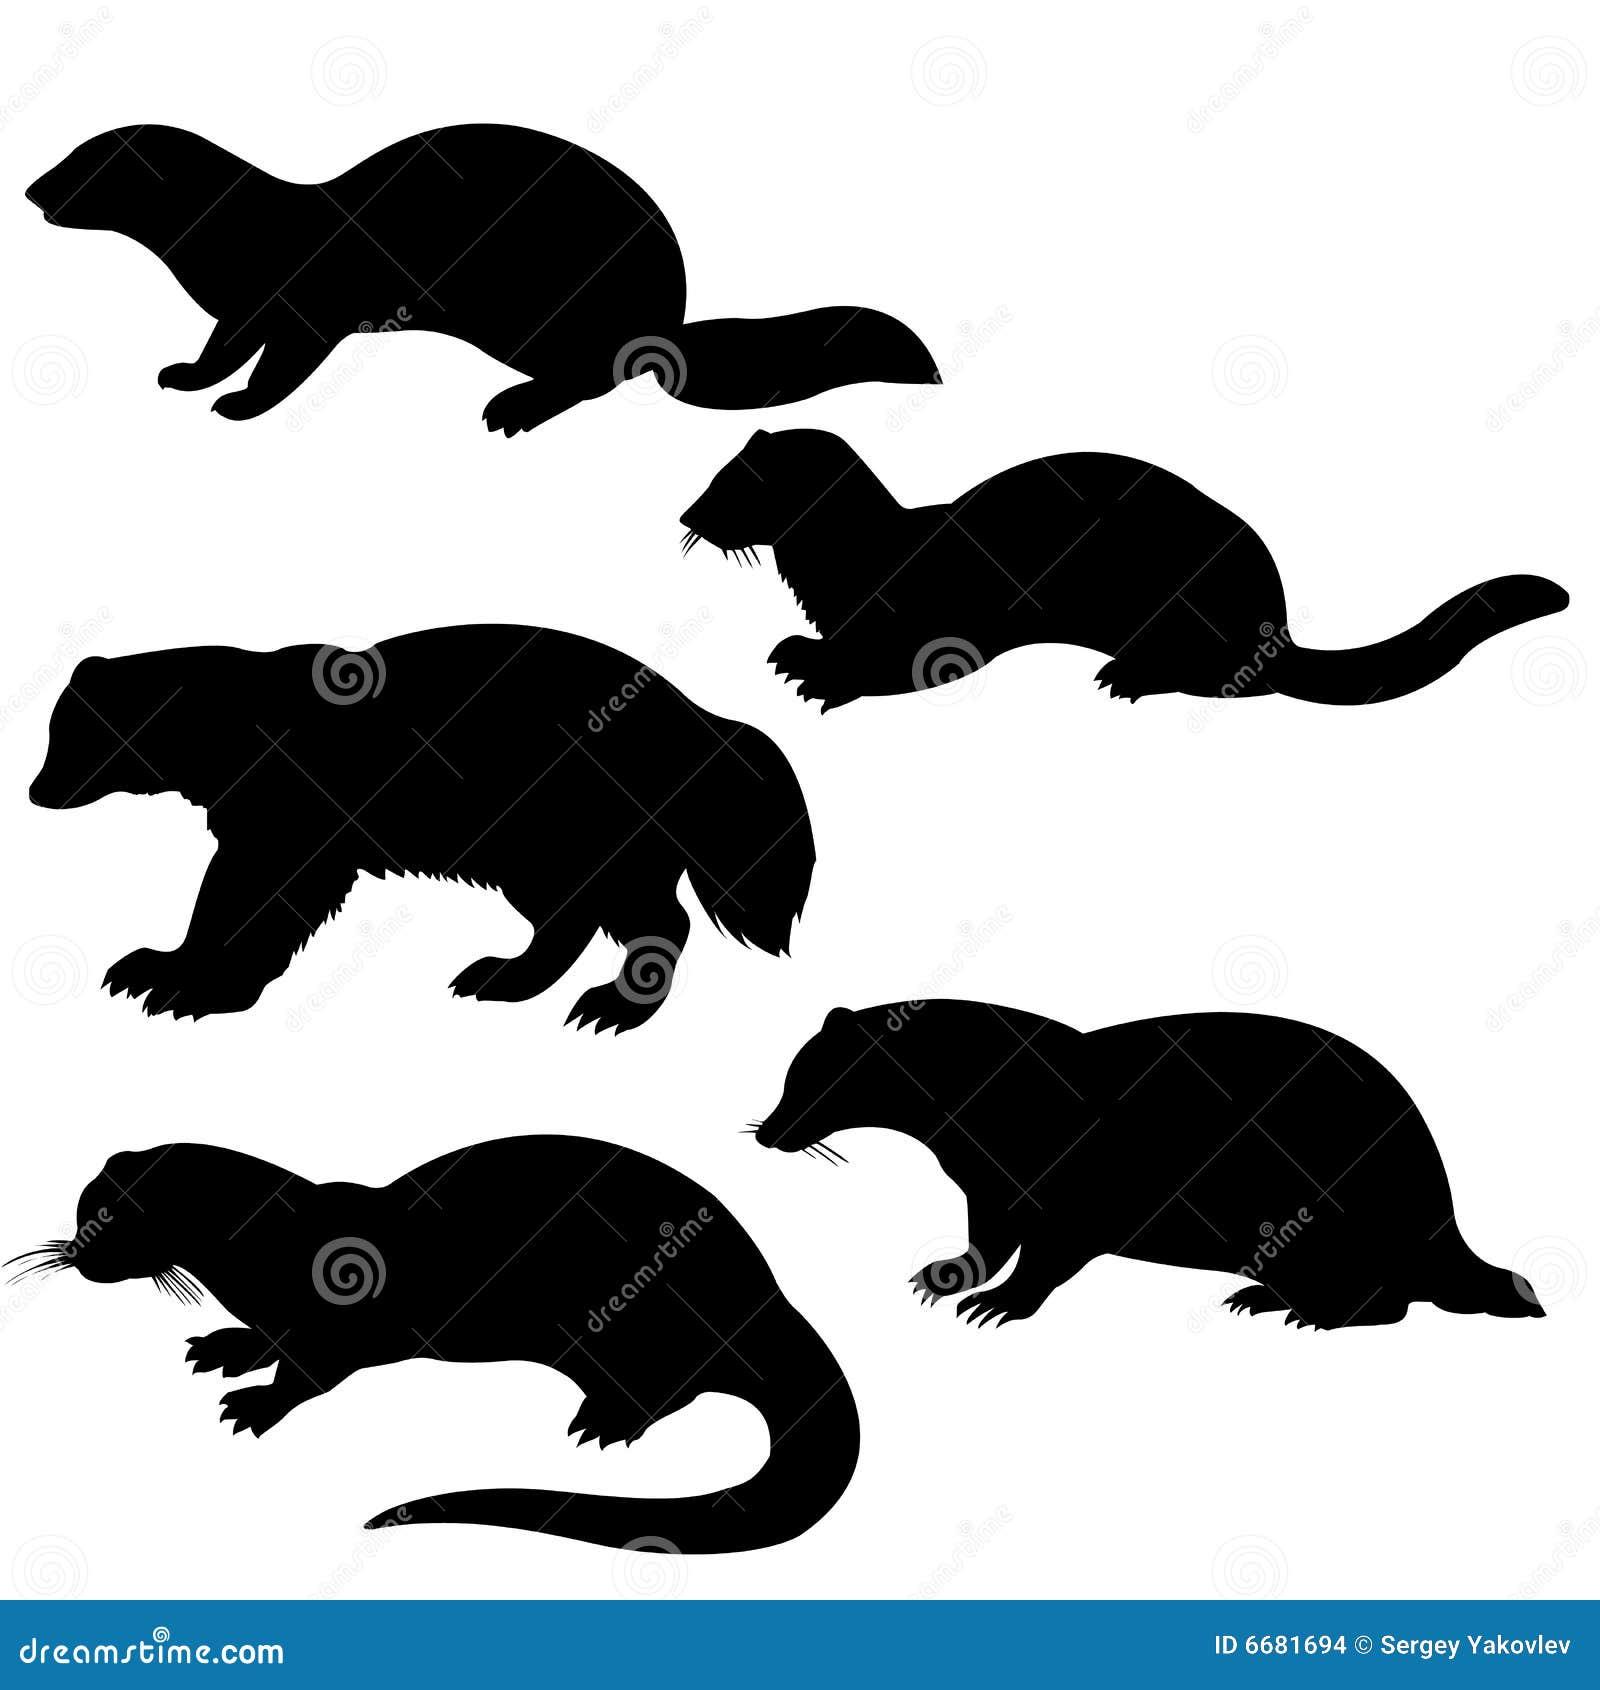 Silhouettes animal